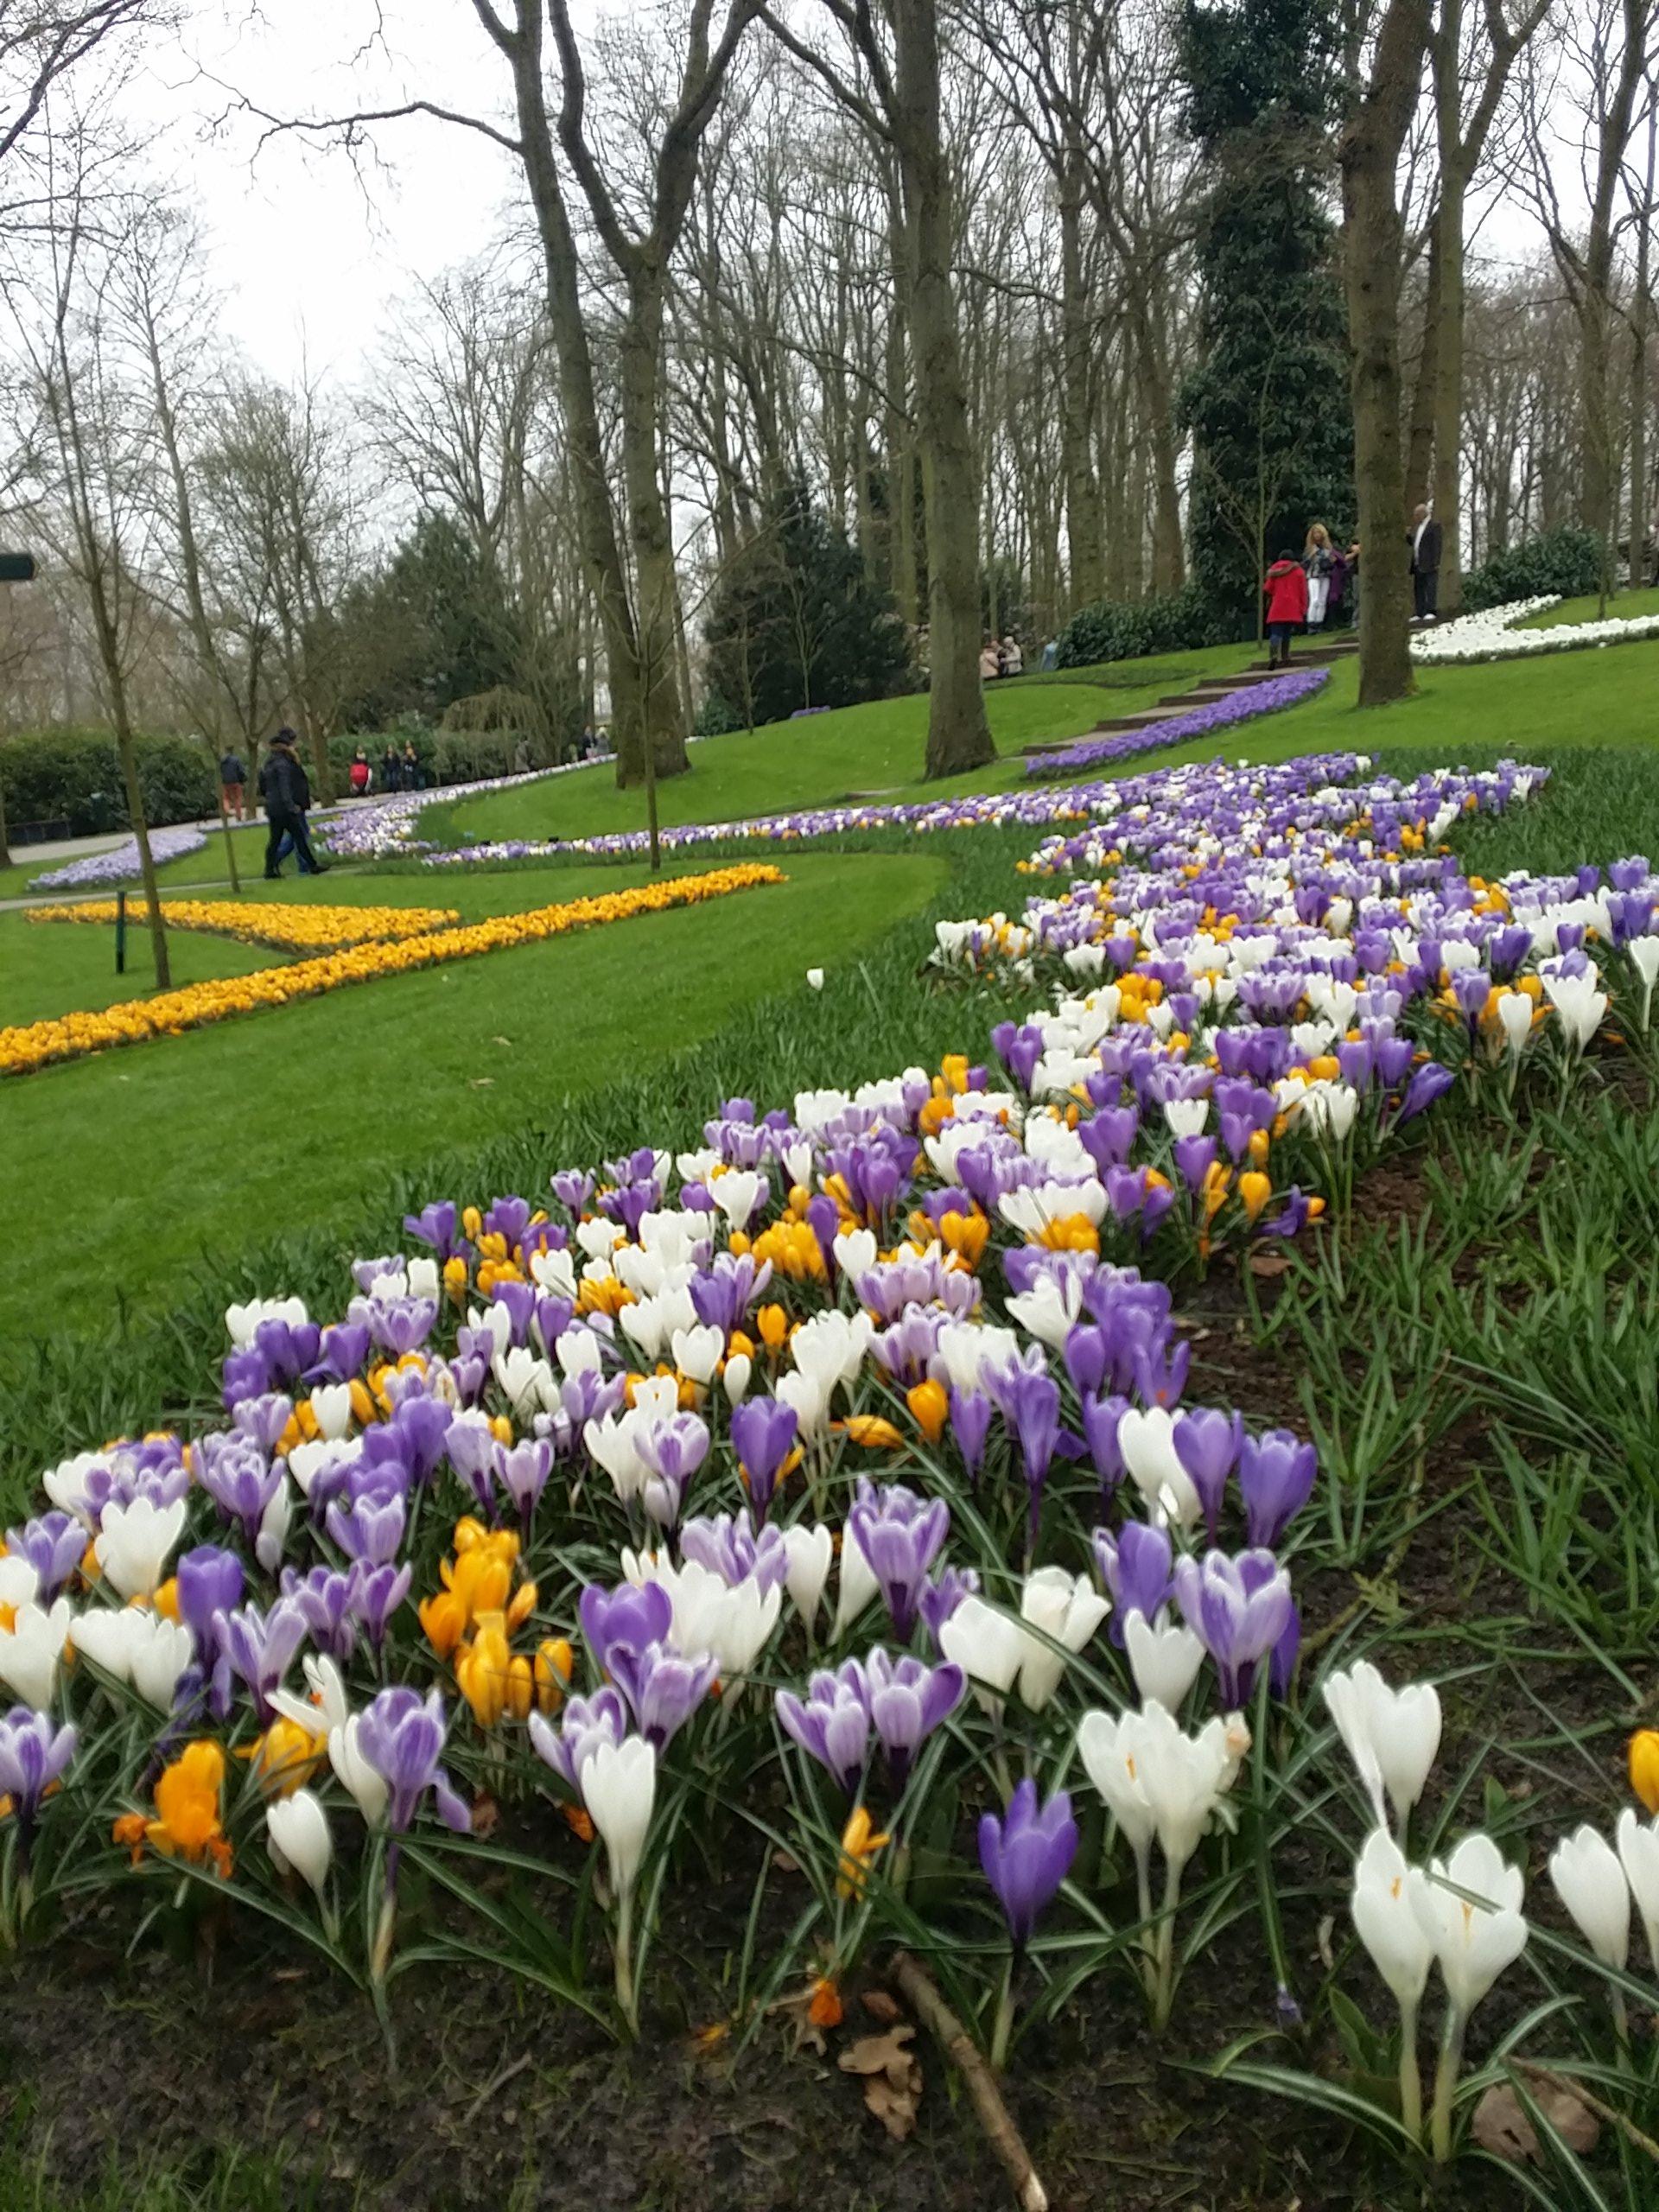 Keukenhof, Taman Bunga Tulip di Belanda, Bunga yang Indah, Bunga yang berasal dari Turki, Pemandu Wisata Orang Indonesia, Serbalanda, Serbalanda Tour, Serba Belanda